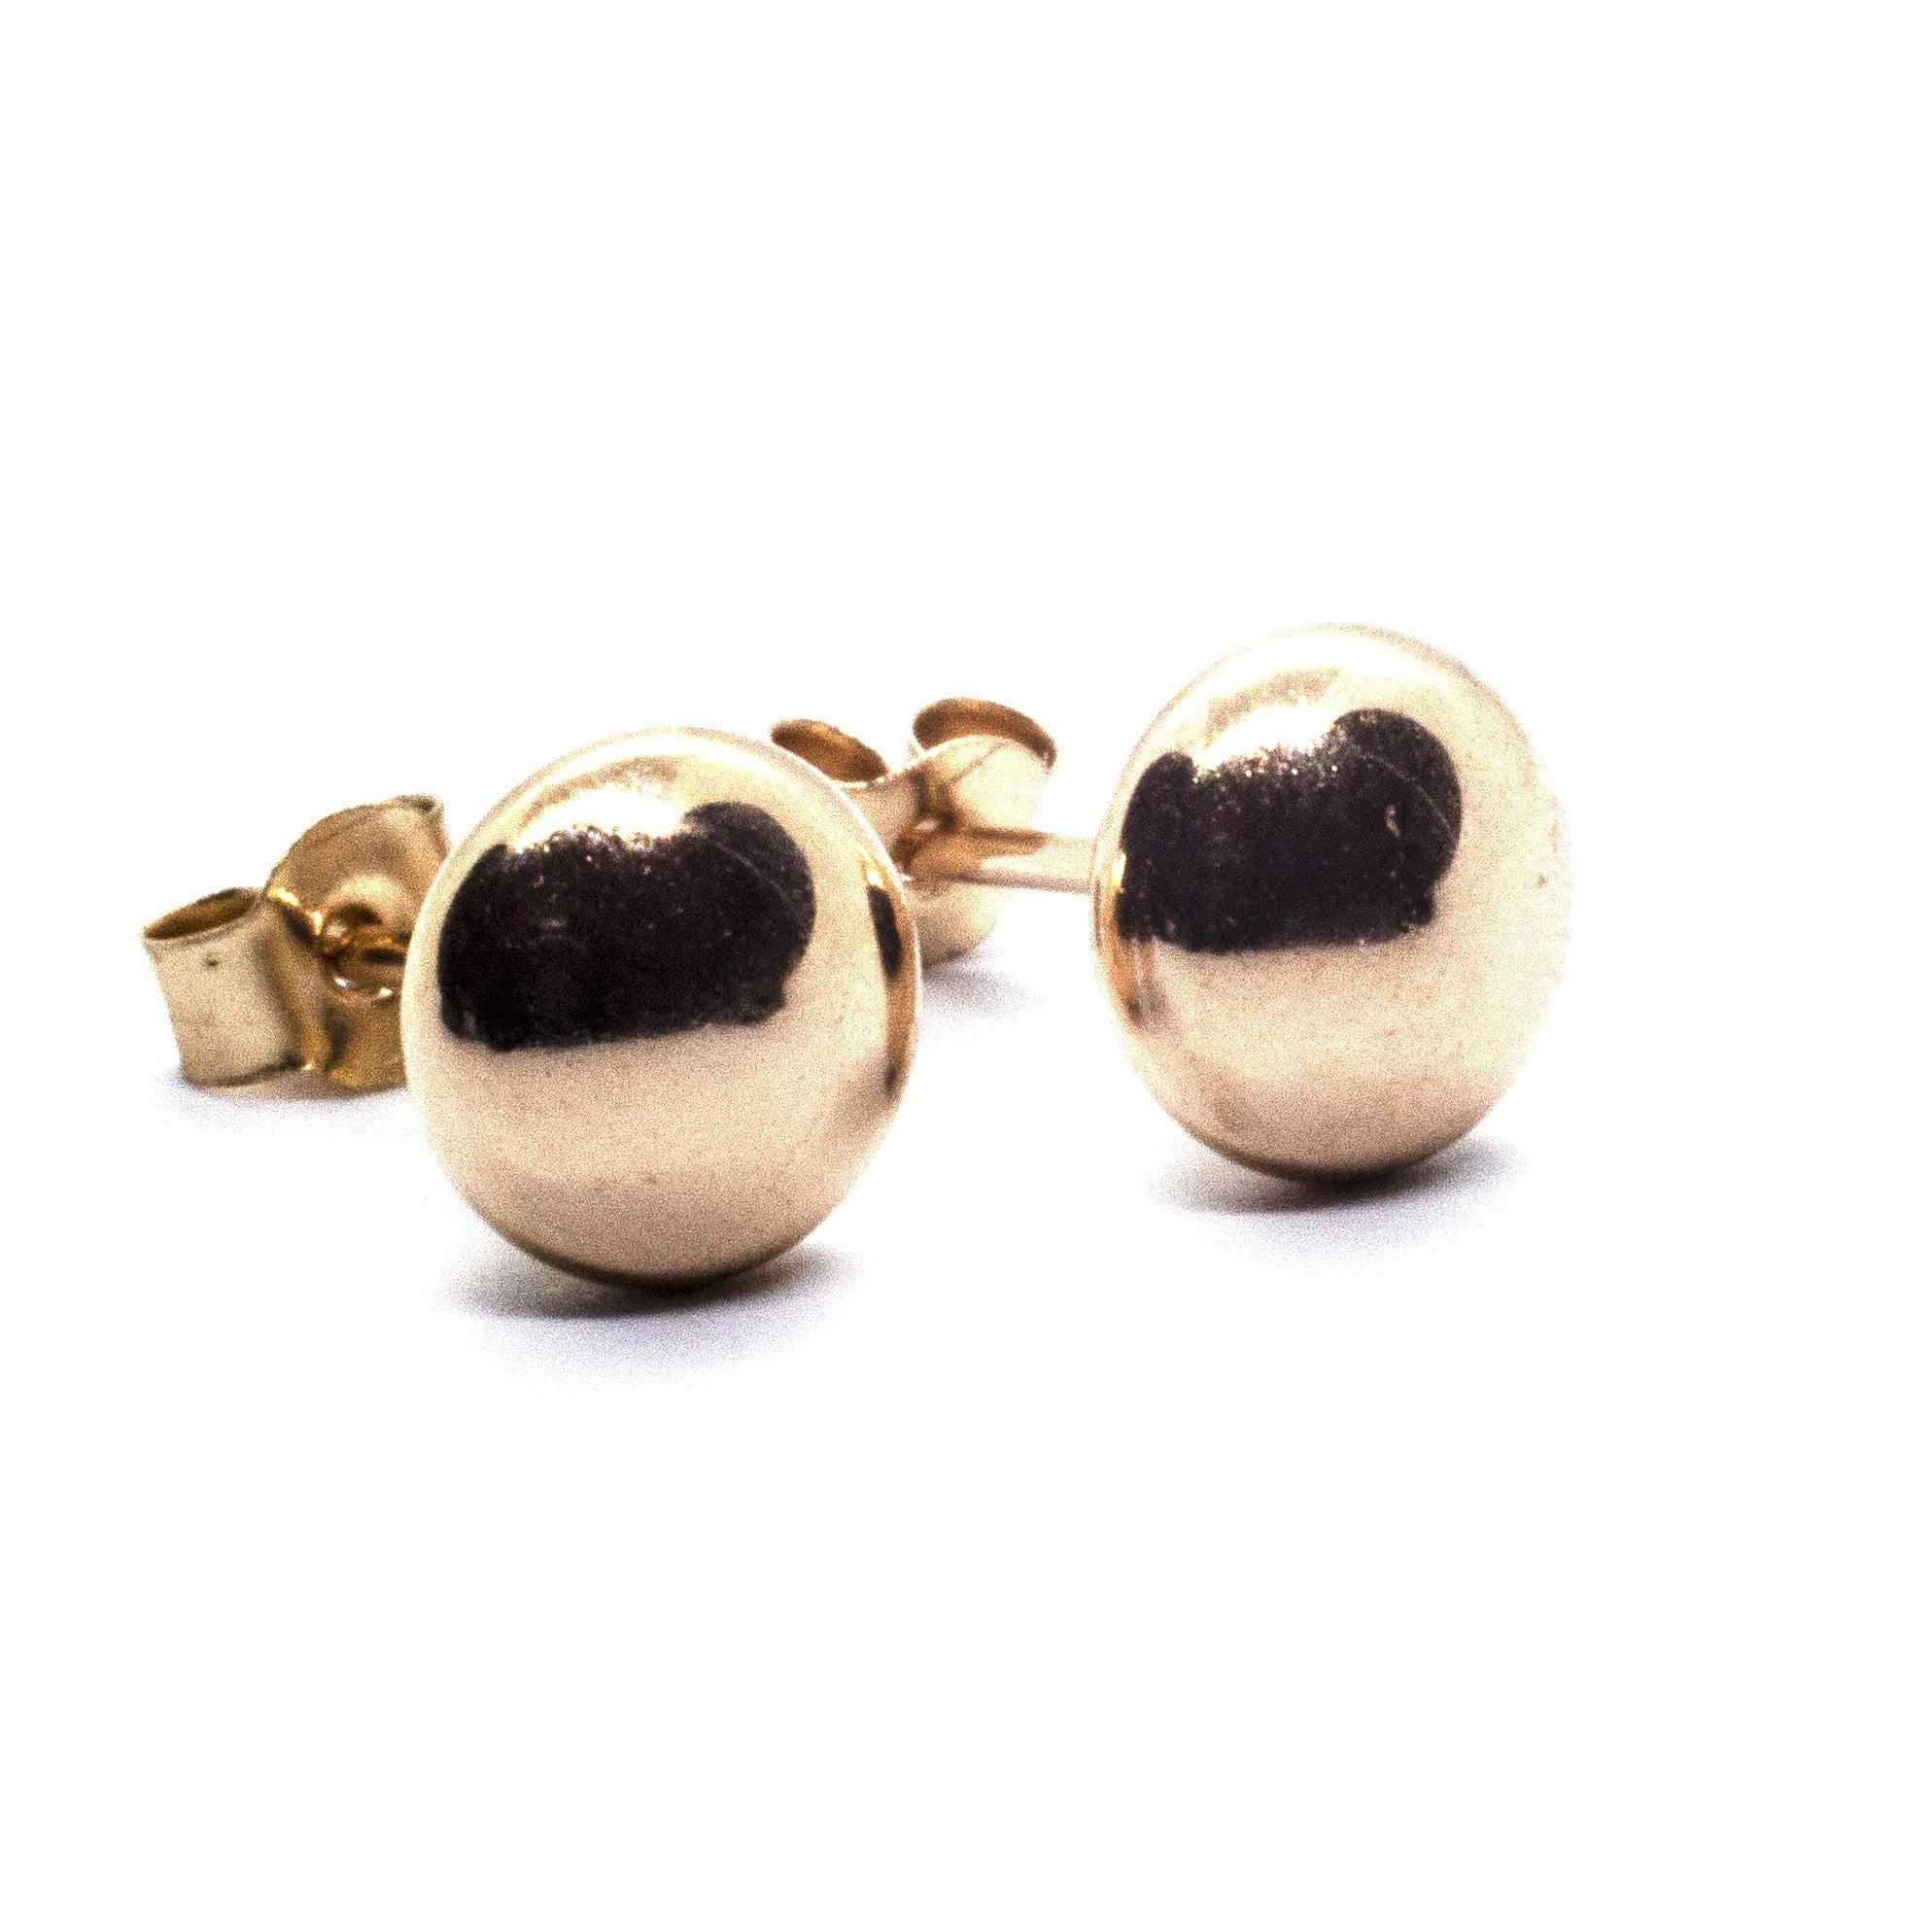 5mm yellow gold bouton earrings